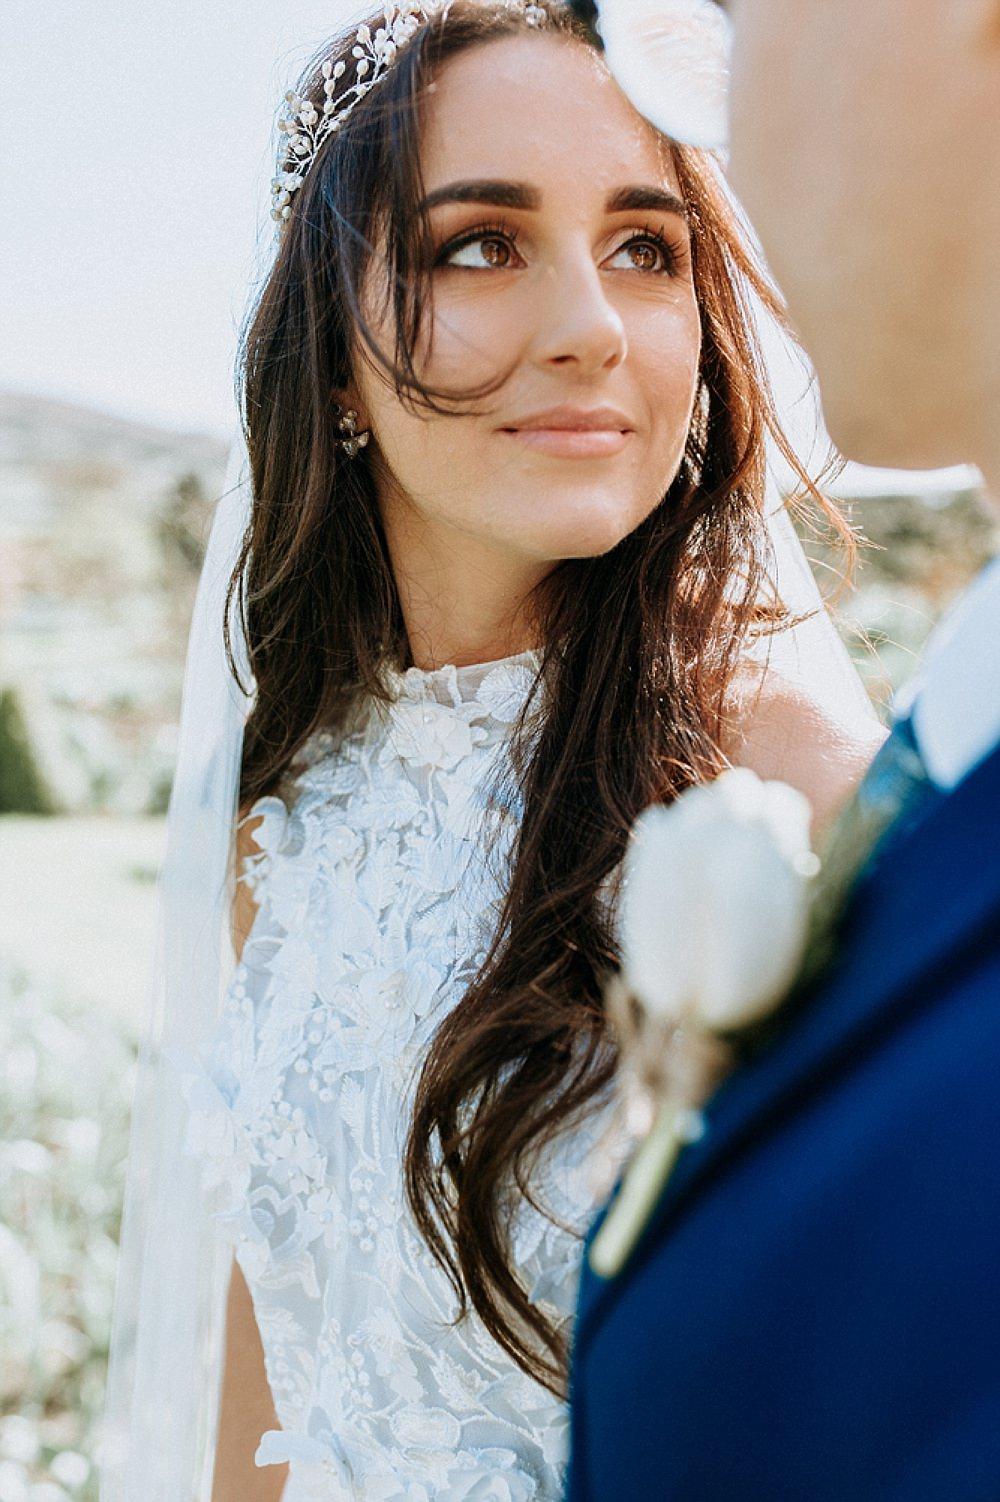 Make Up Bride Bridal Blue Gold Wedding Ideas Ailsa Reeve Photography